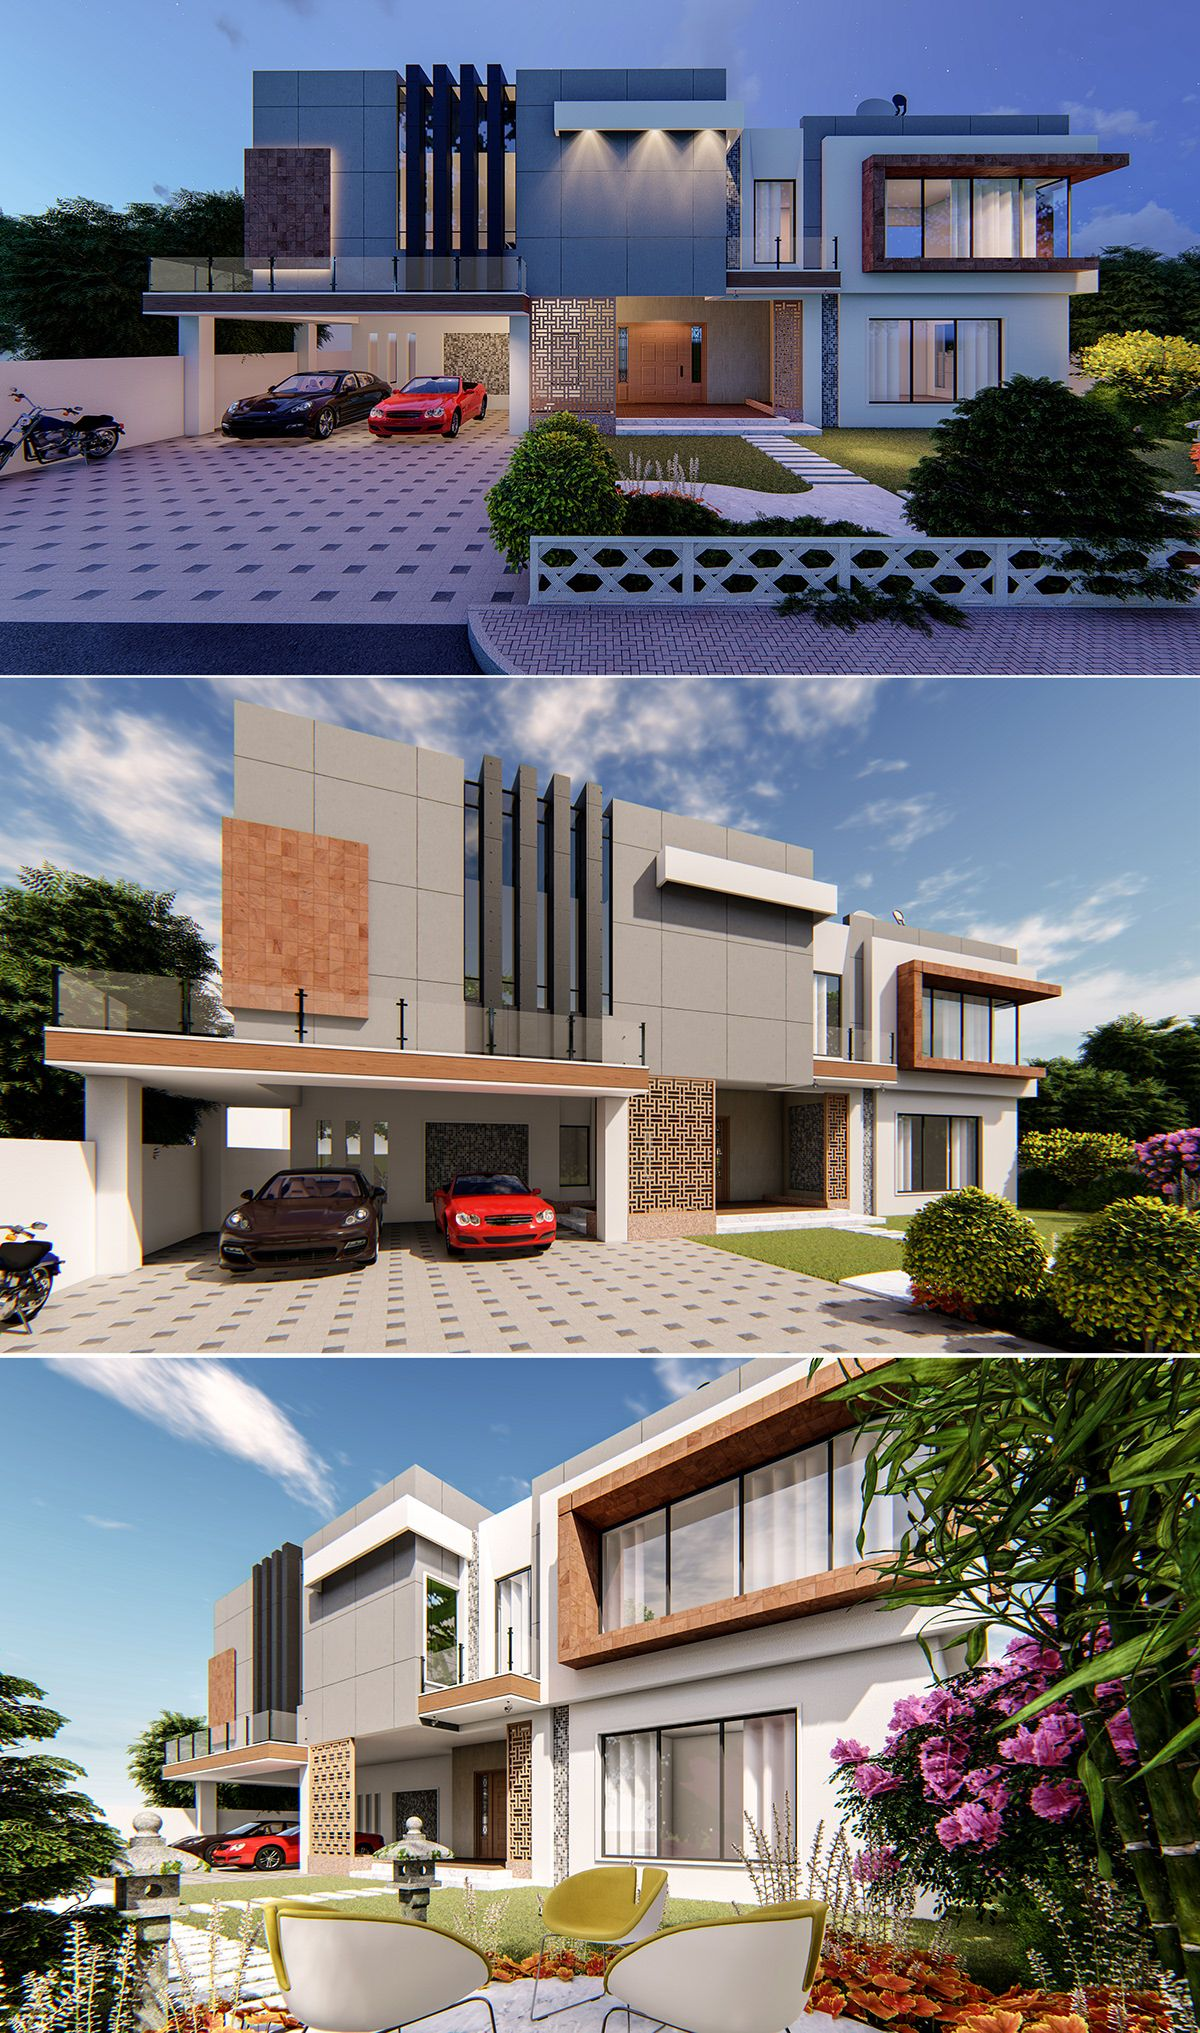 233a3e7dd35e9deaf59766bec704022d - 33+ Village Small House Front Design  Pictures